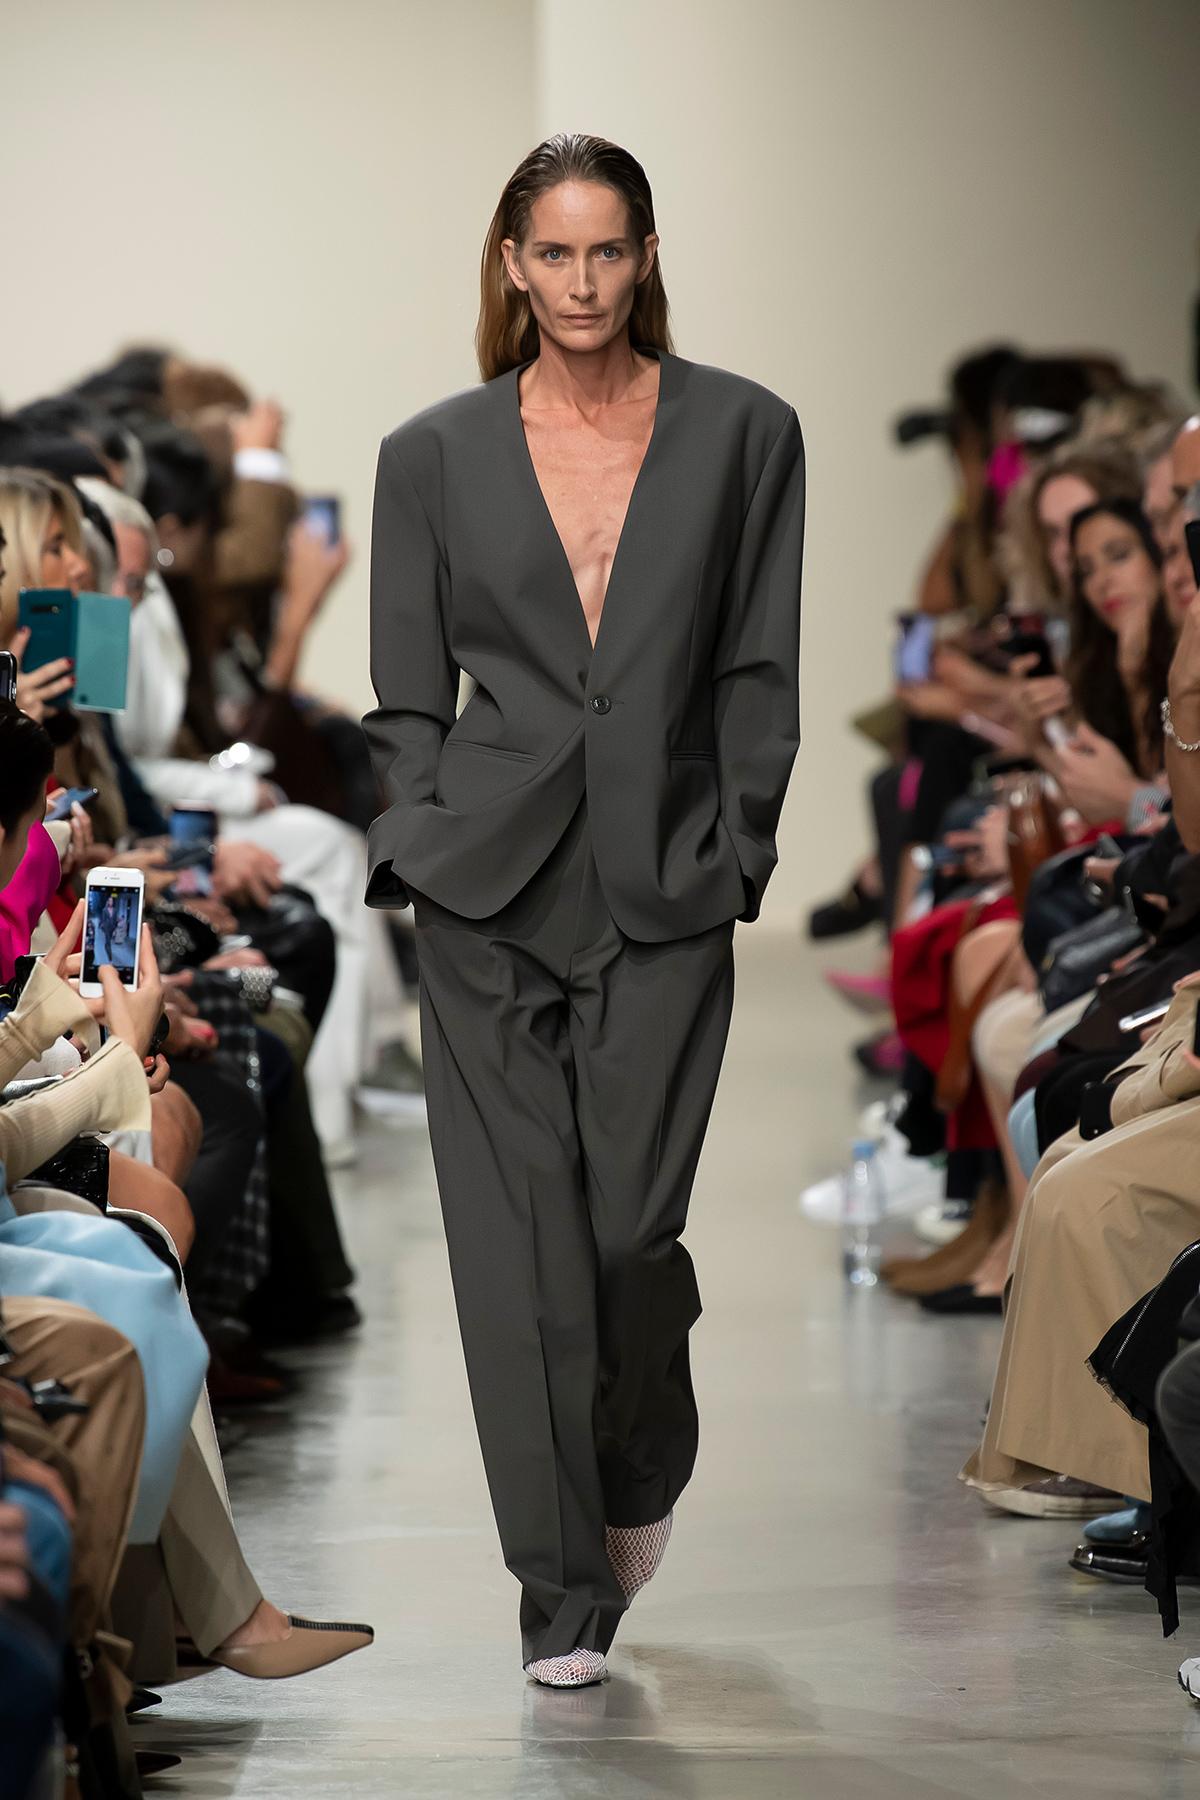 LOOK 18 Blazer PERLA Trousers PRISCO